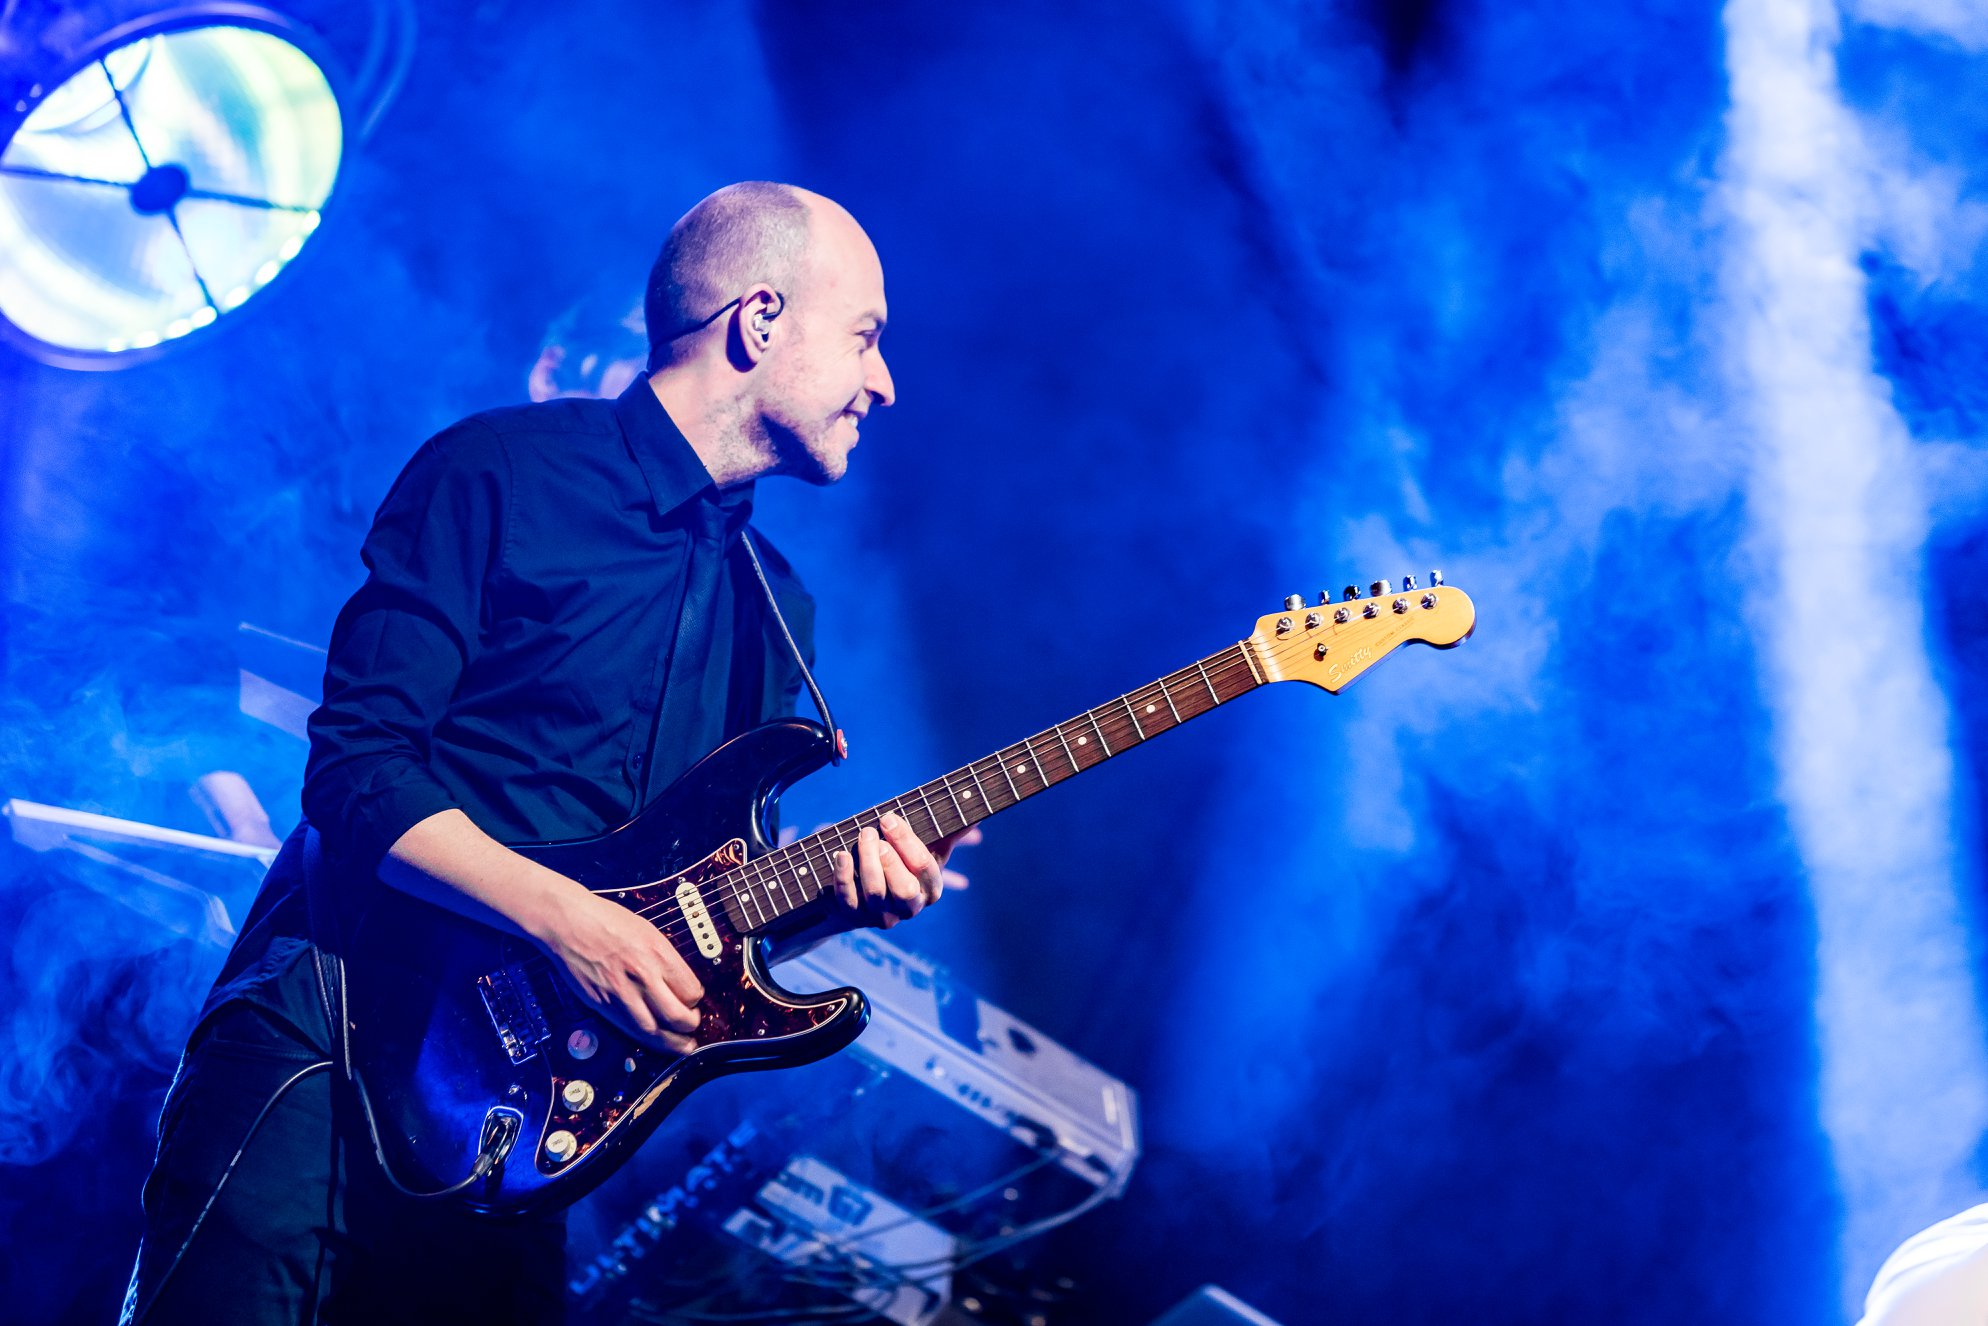 Gitarist coverband ACT ON DEMAND - Niels van der Steenhoven